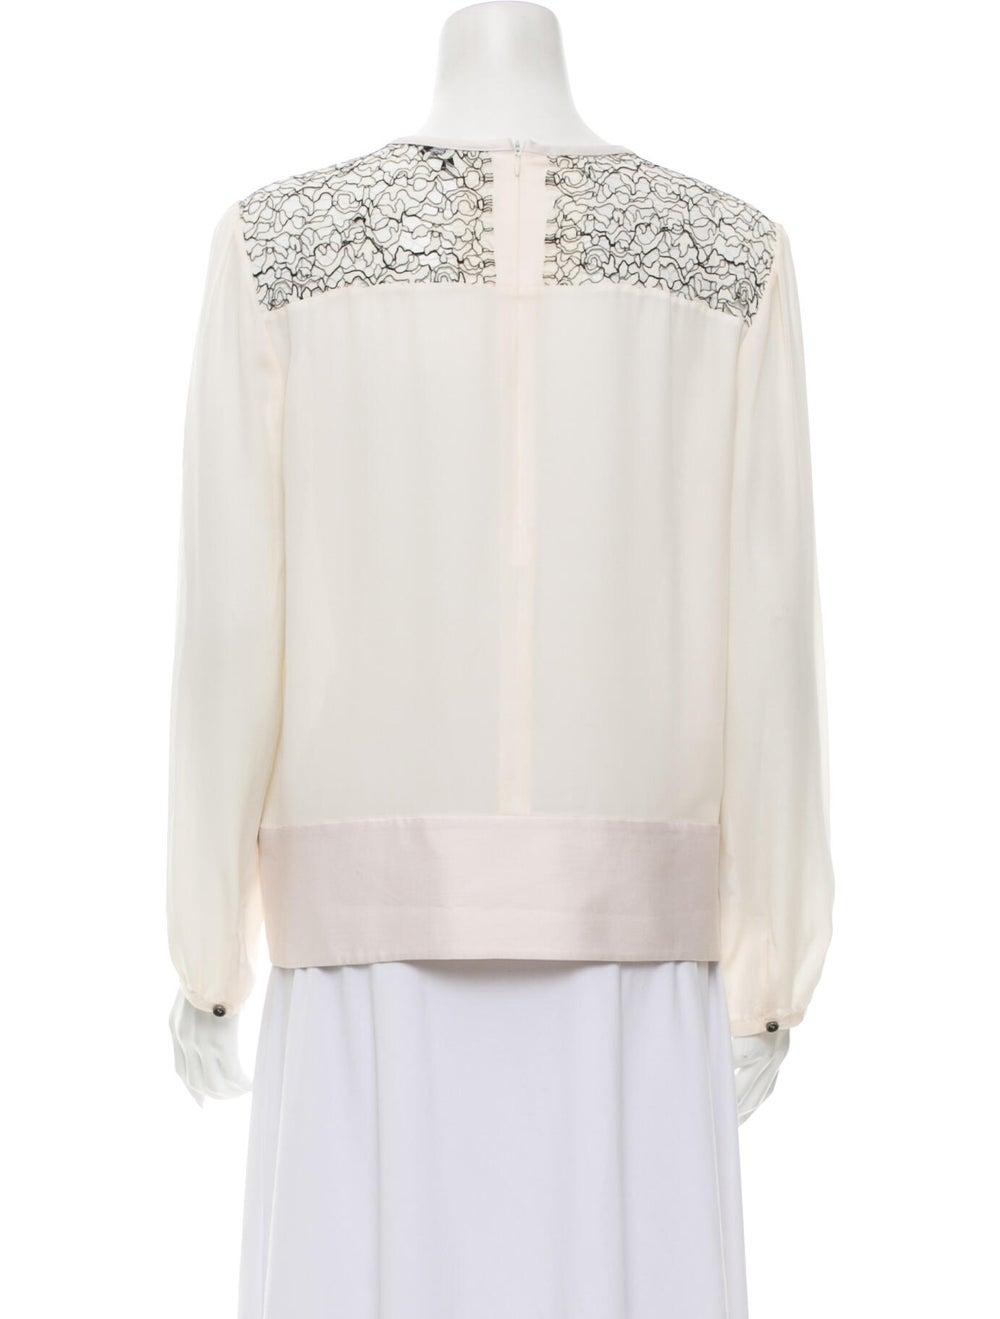 Marissa Webb Silk Lace Pattern Top White - image 3